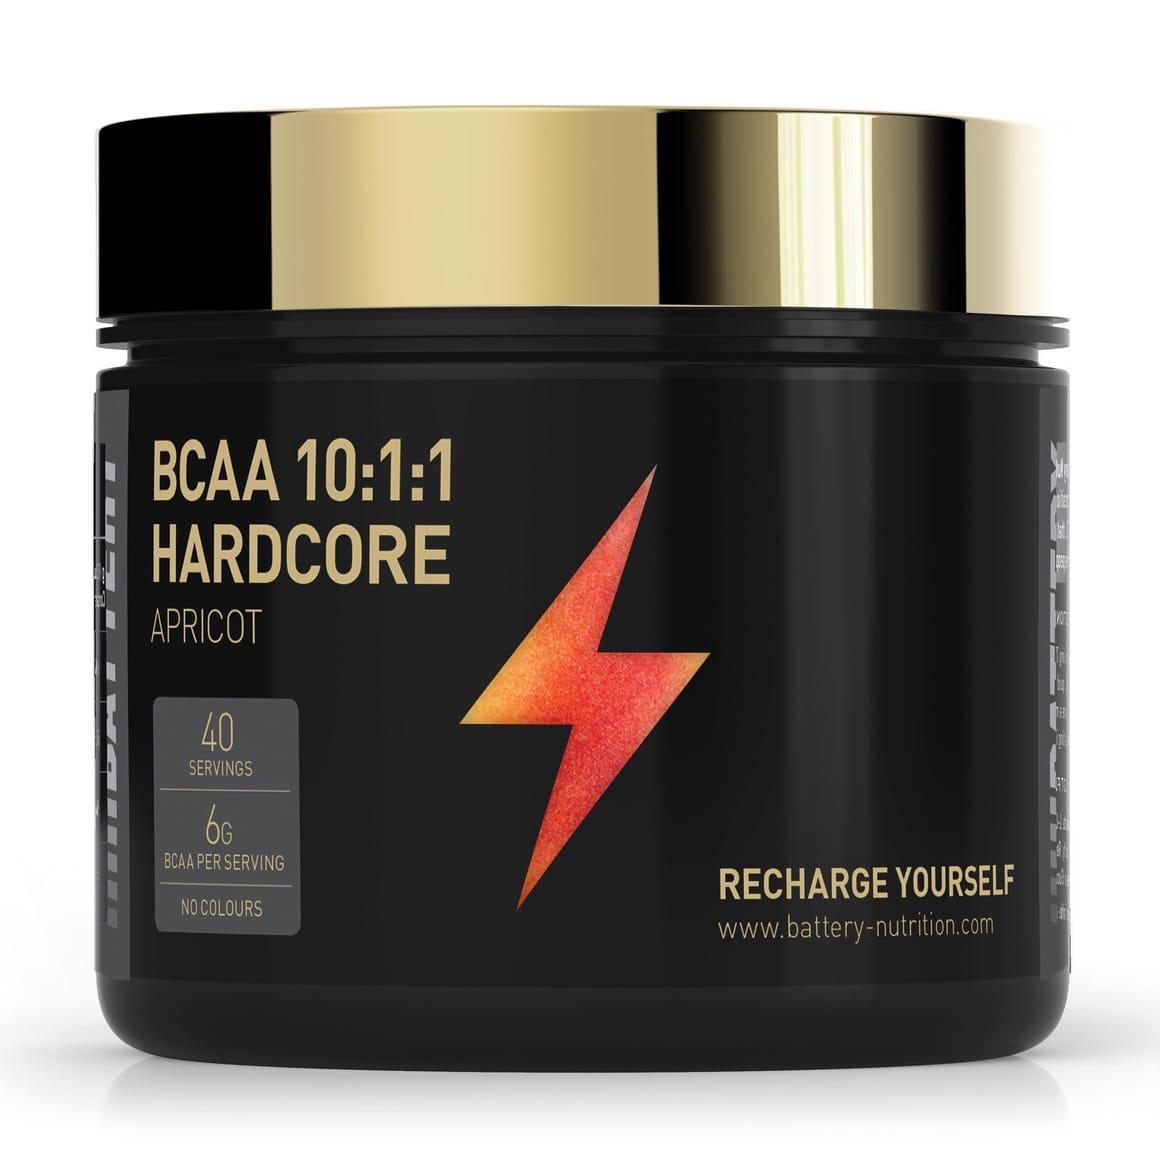 Battery BCAA 10:1:1 Hardcore, 300g